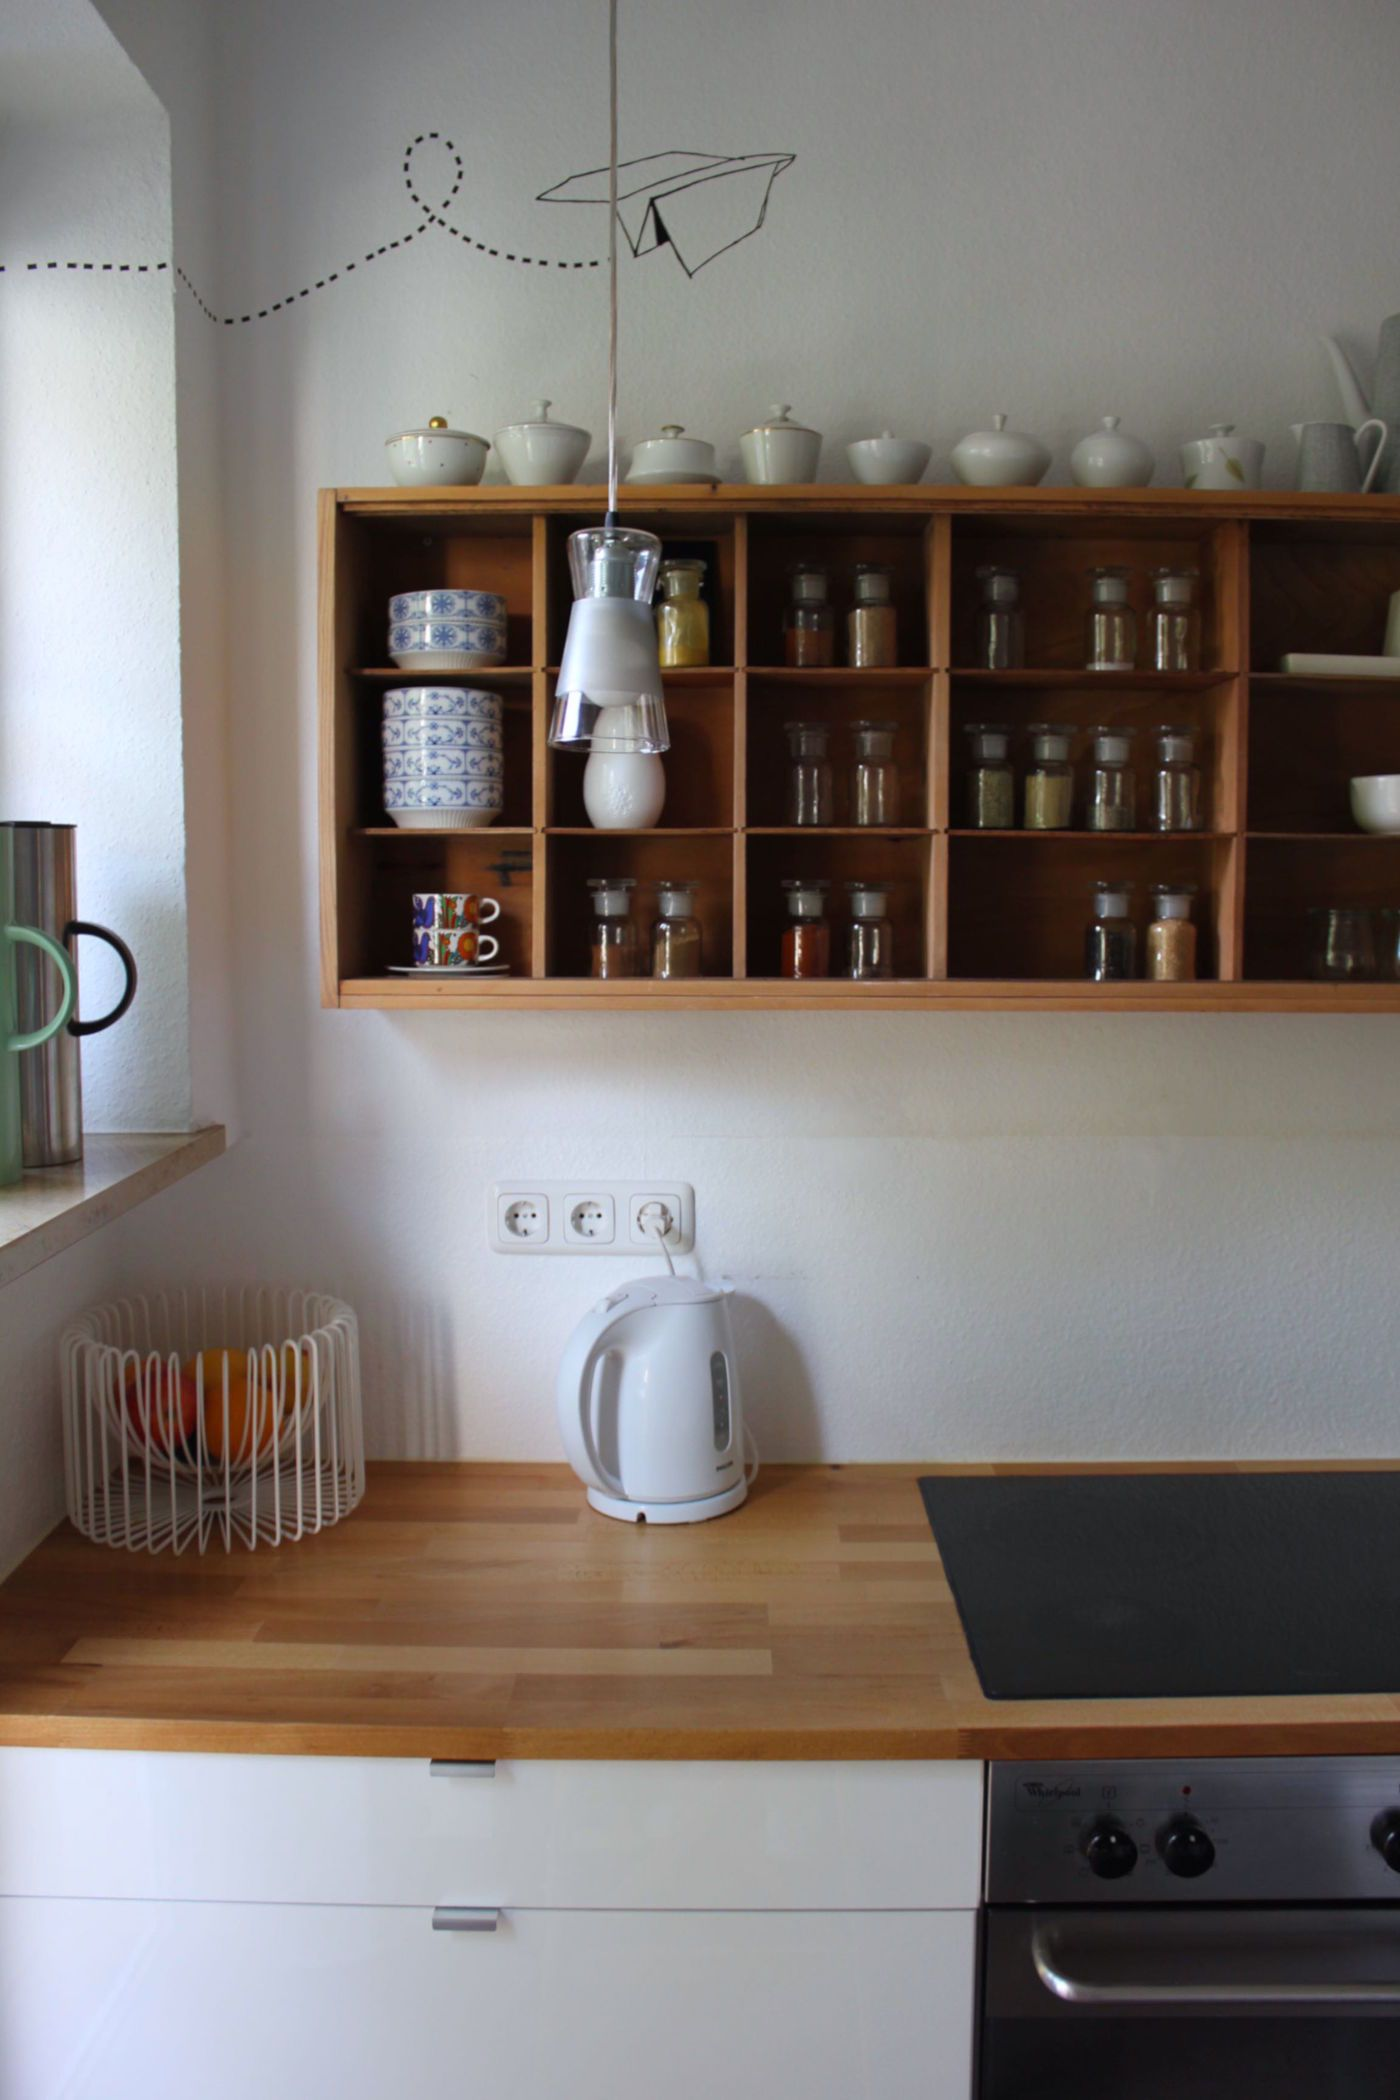 ideen f r dein gew rzregal. Black Bedroom Furniture Sets. Home Design Ideas